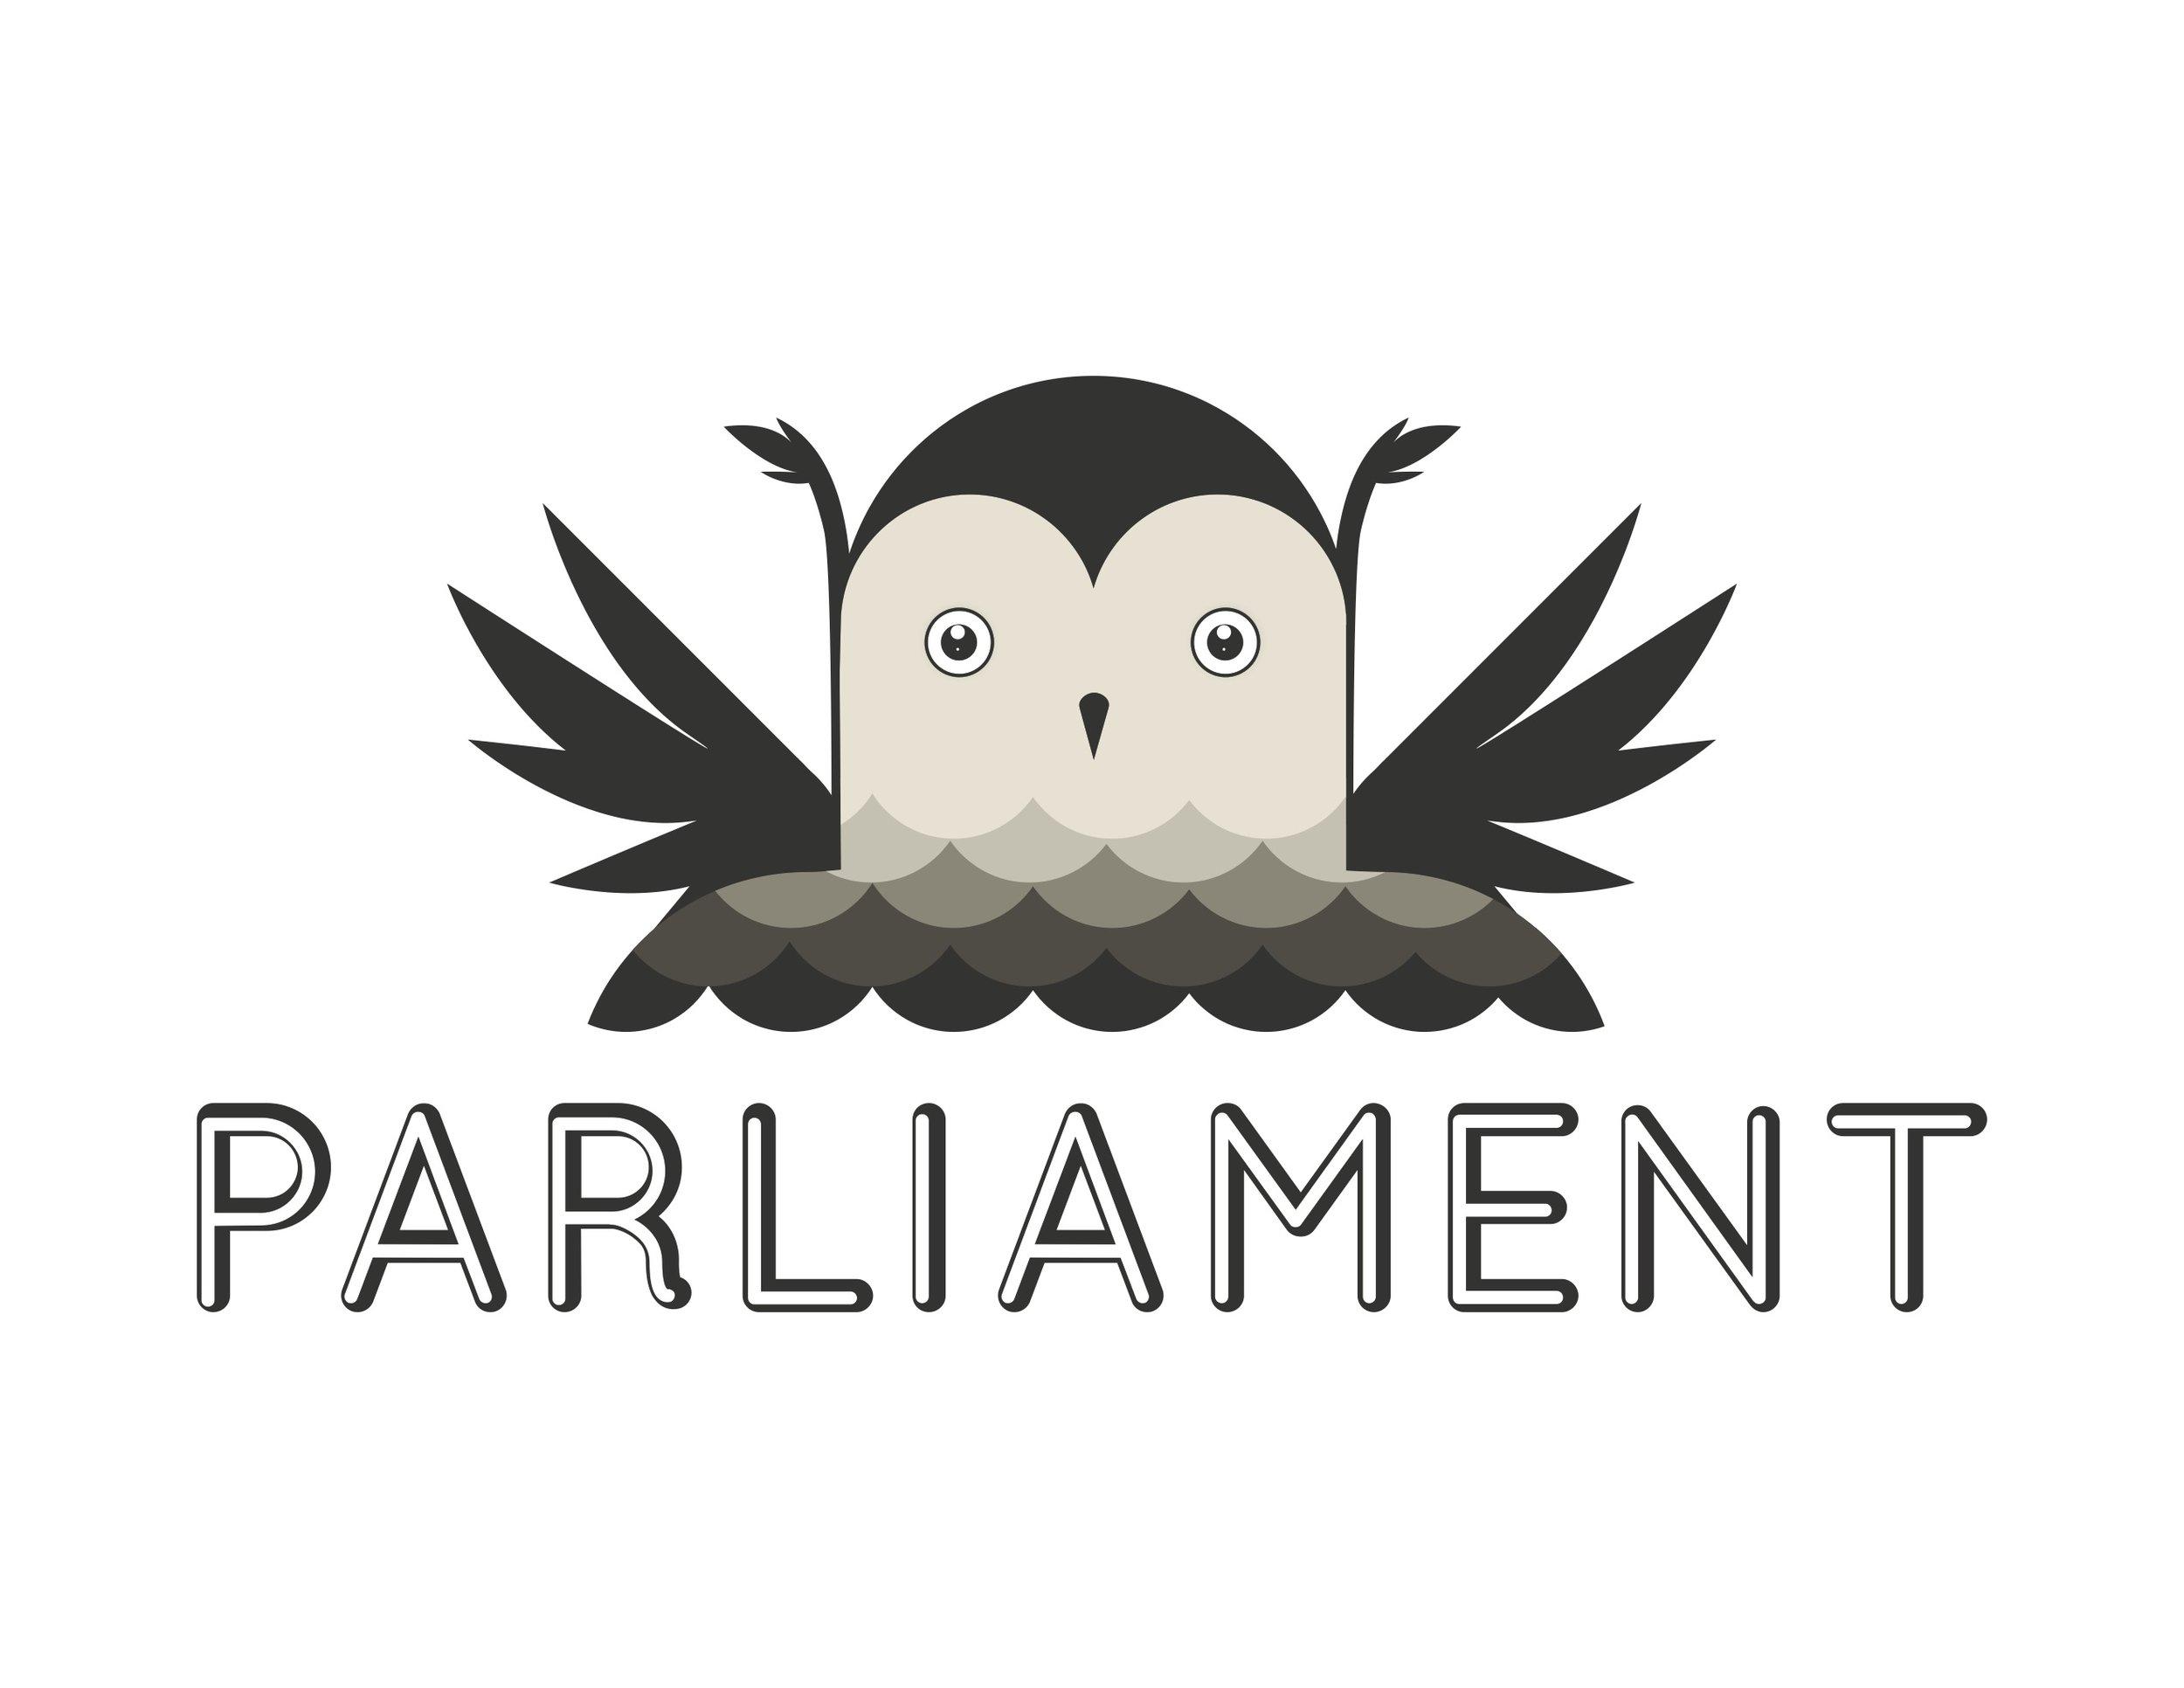 parliament_logo_LargeLarge.jpg